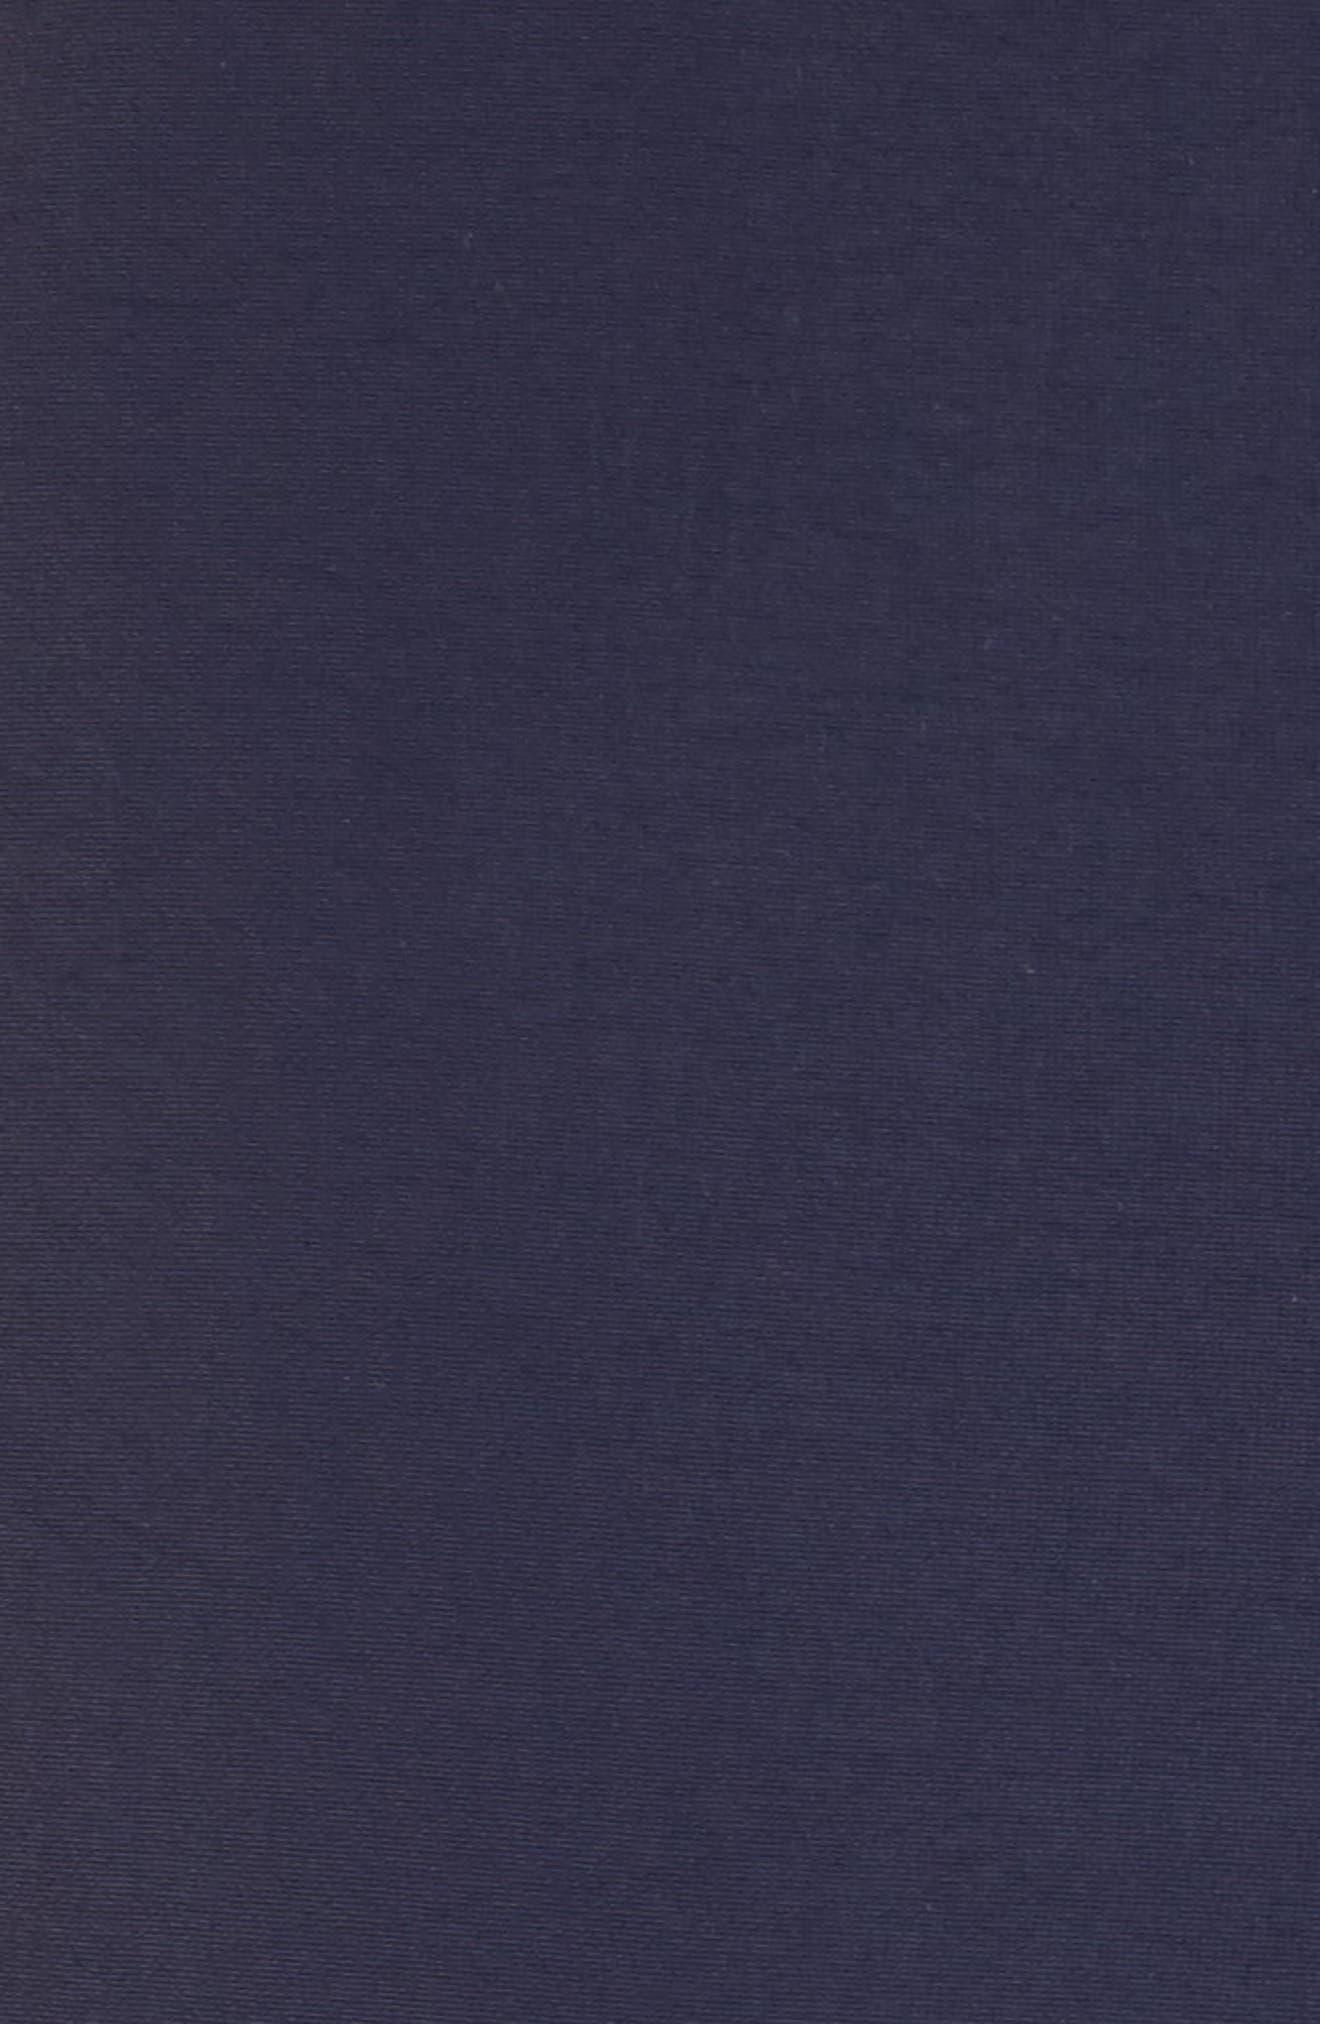 Aruba Tailored Fit French Stripe Swim Trunks,                             Alternate thumbnail 5, color,                             Navy French Stripes